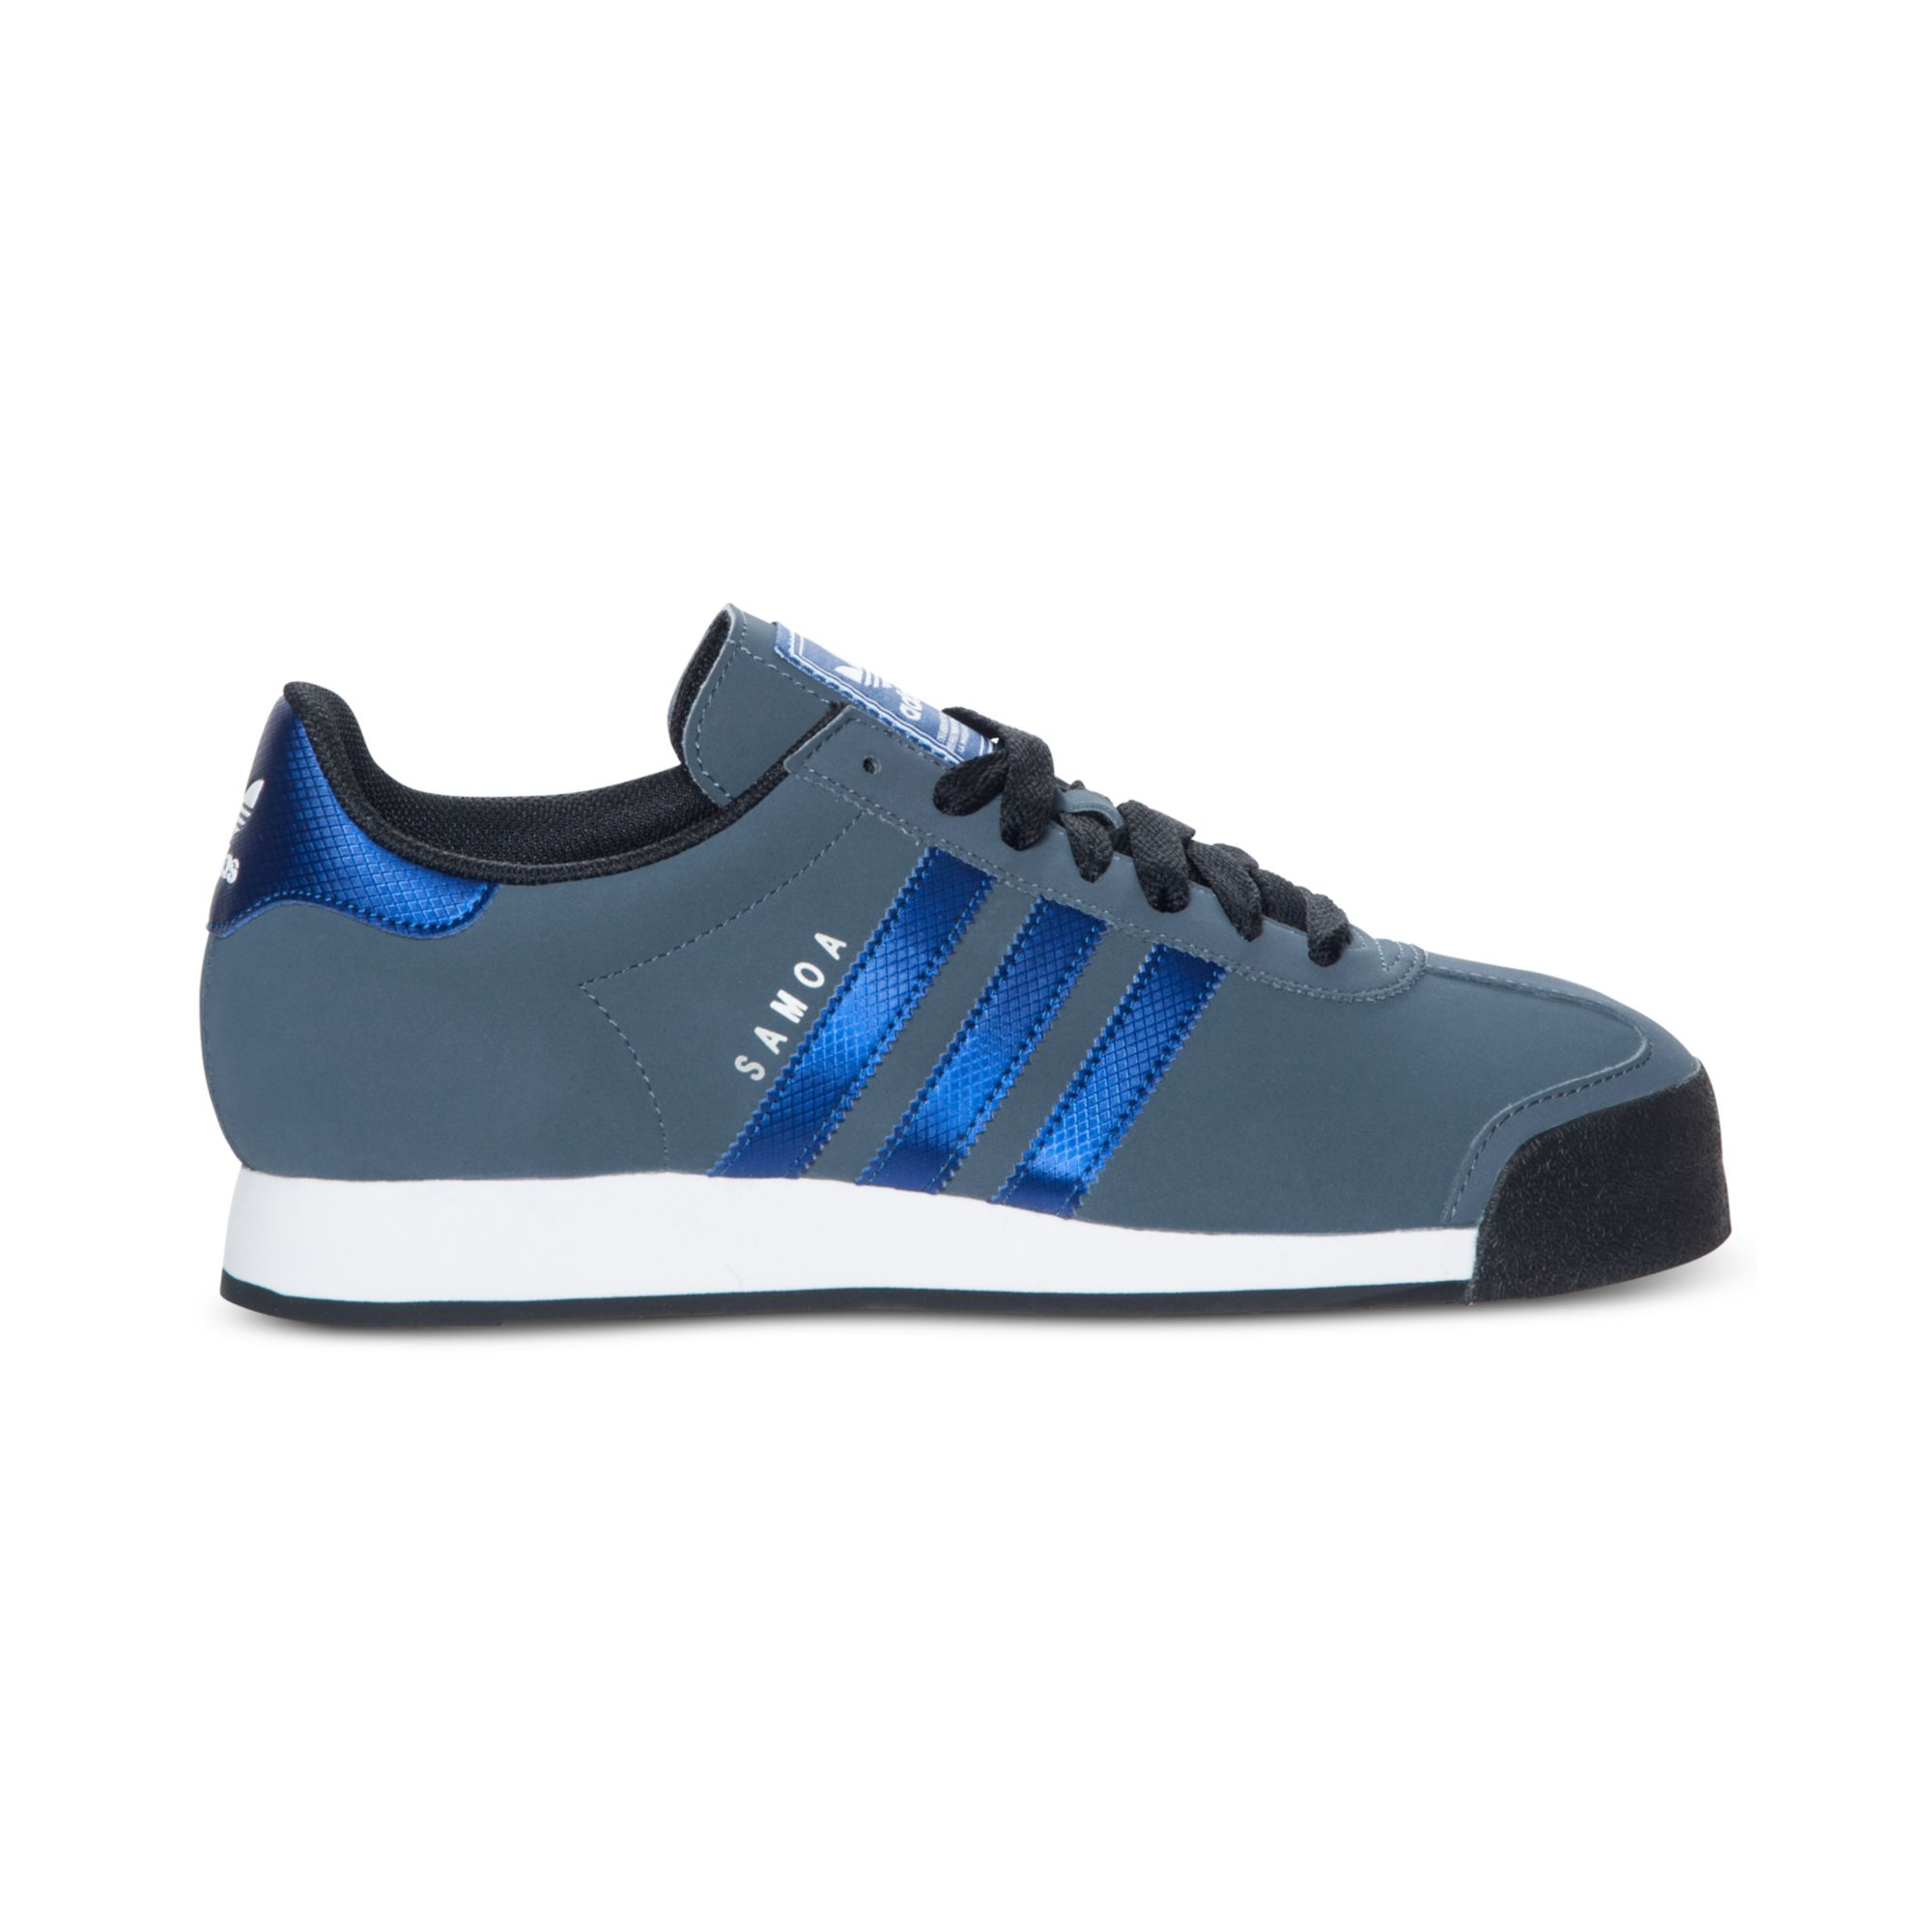 timeless design 401f1 0d185 Lyst Adidas Samoa Sneakers In Blue For Men